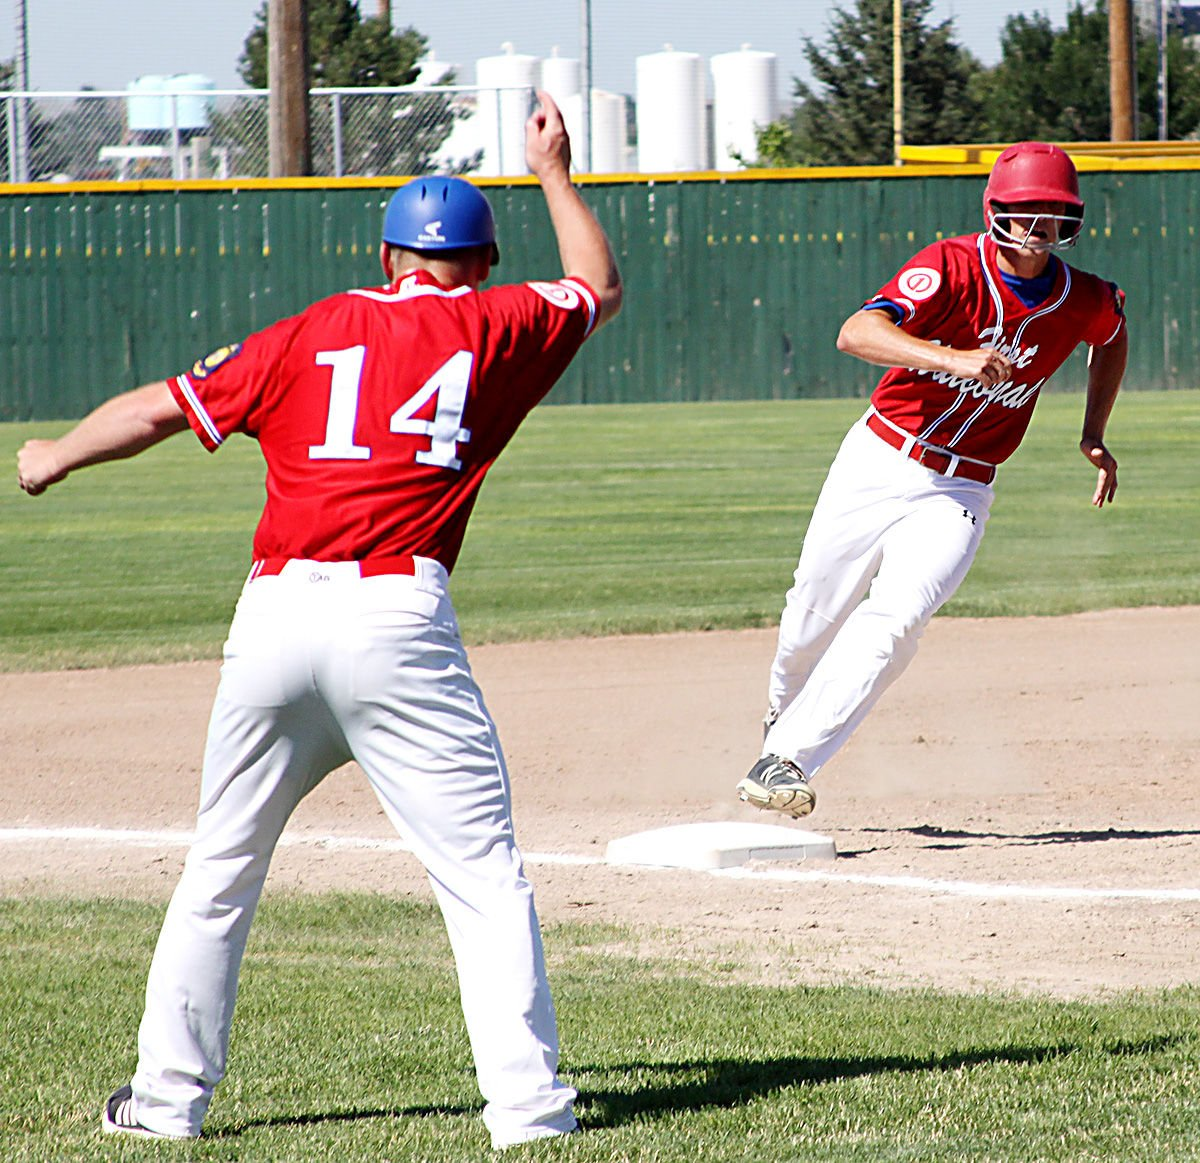 North Platte rallies to stun Kearney in 11-inning slugfest